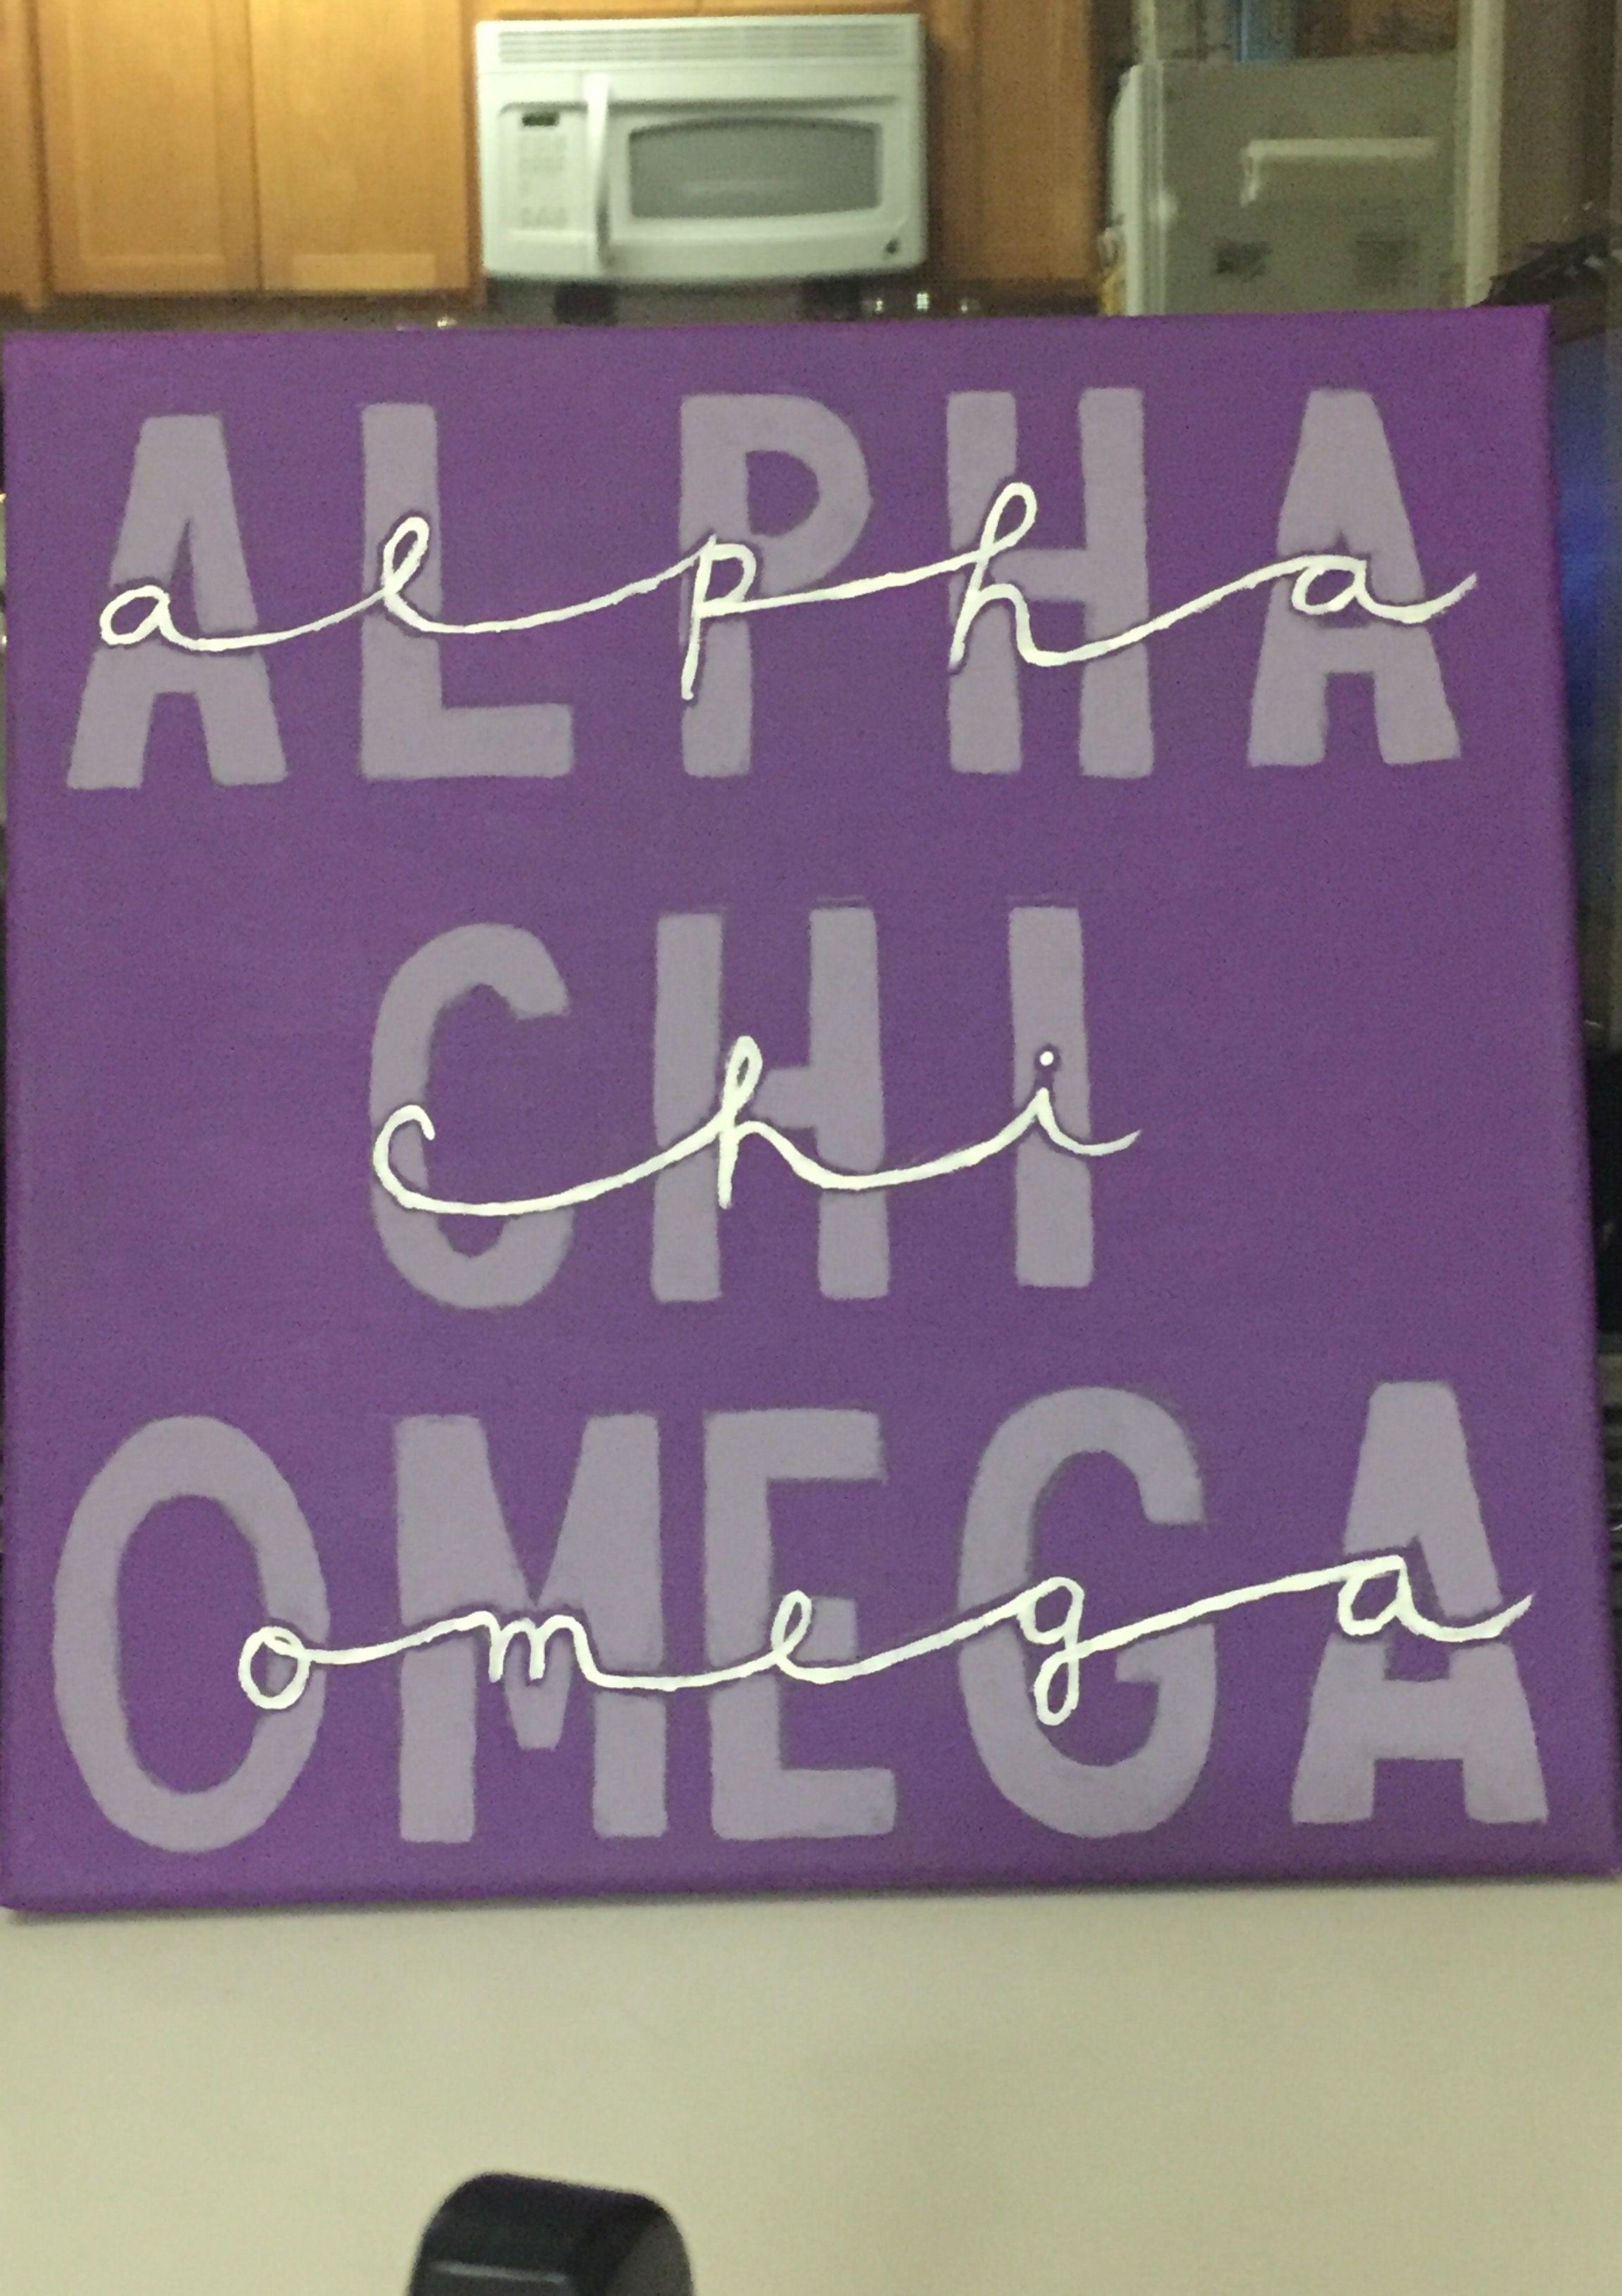 Alpha chi omega canvas big little crafting paint | ΑΧΩ life | Pinterest